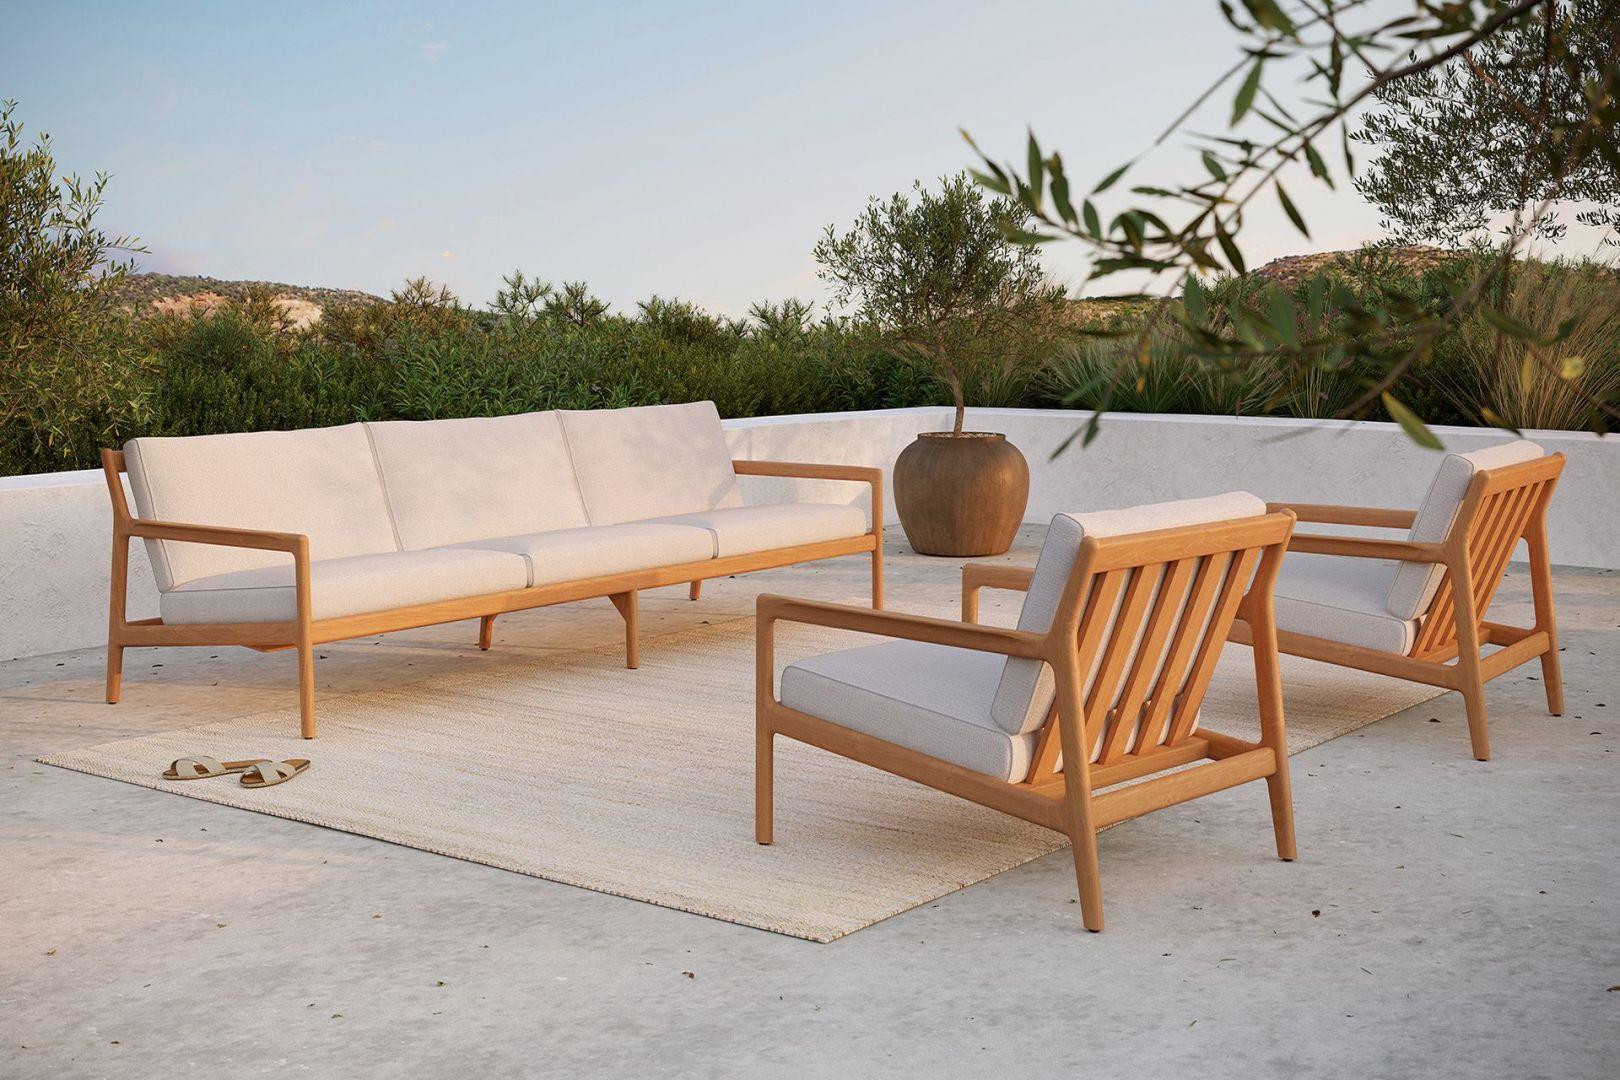 Trzyosobowa sofa z drewna tekowego i fotele Jack Ethnicraft marki NAP. Fot. NAP / Domoteka